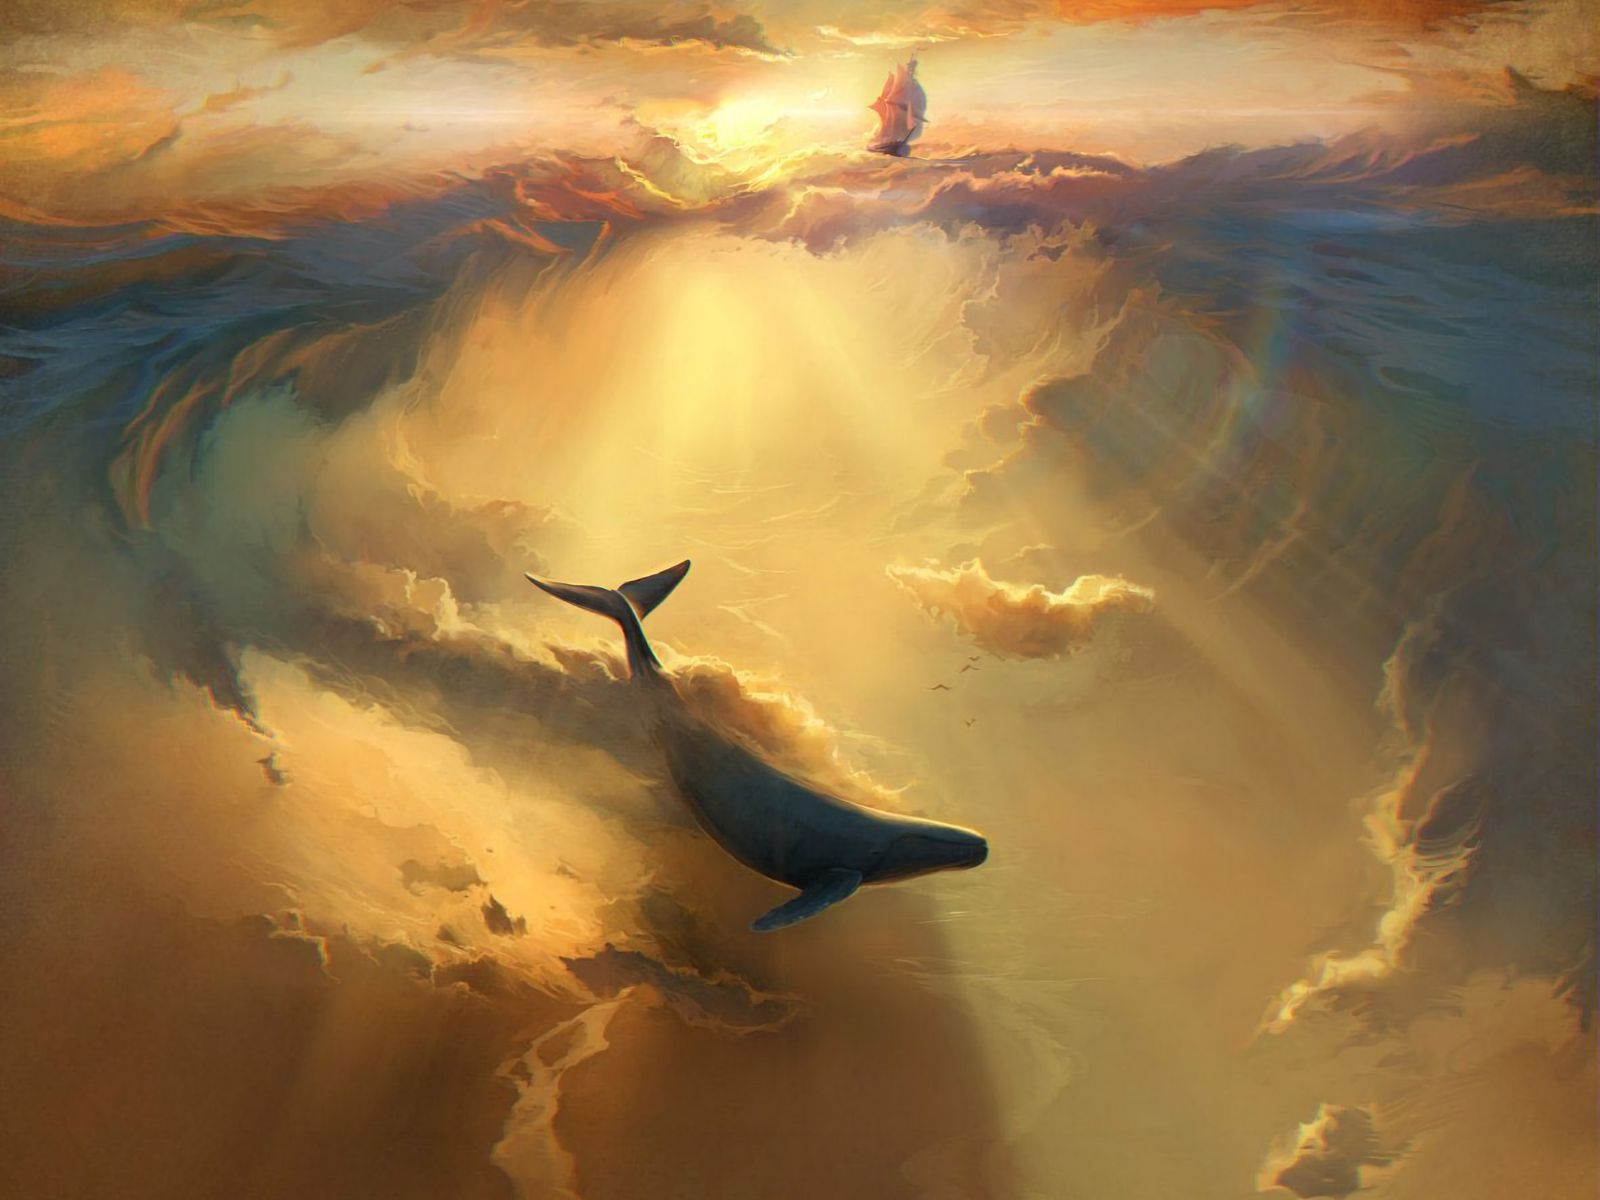 1600x1200 Wallpaper shark, dolphin, sea, art, underwater world